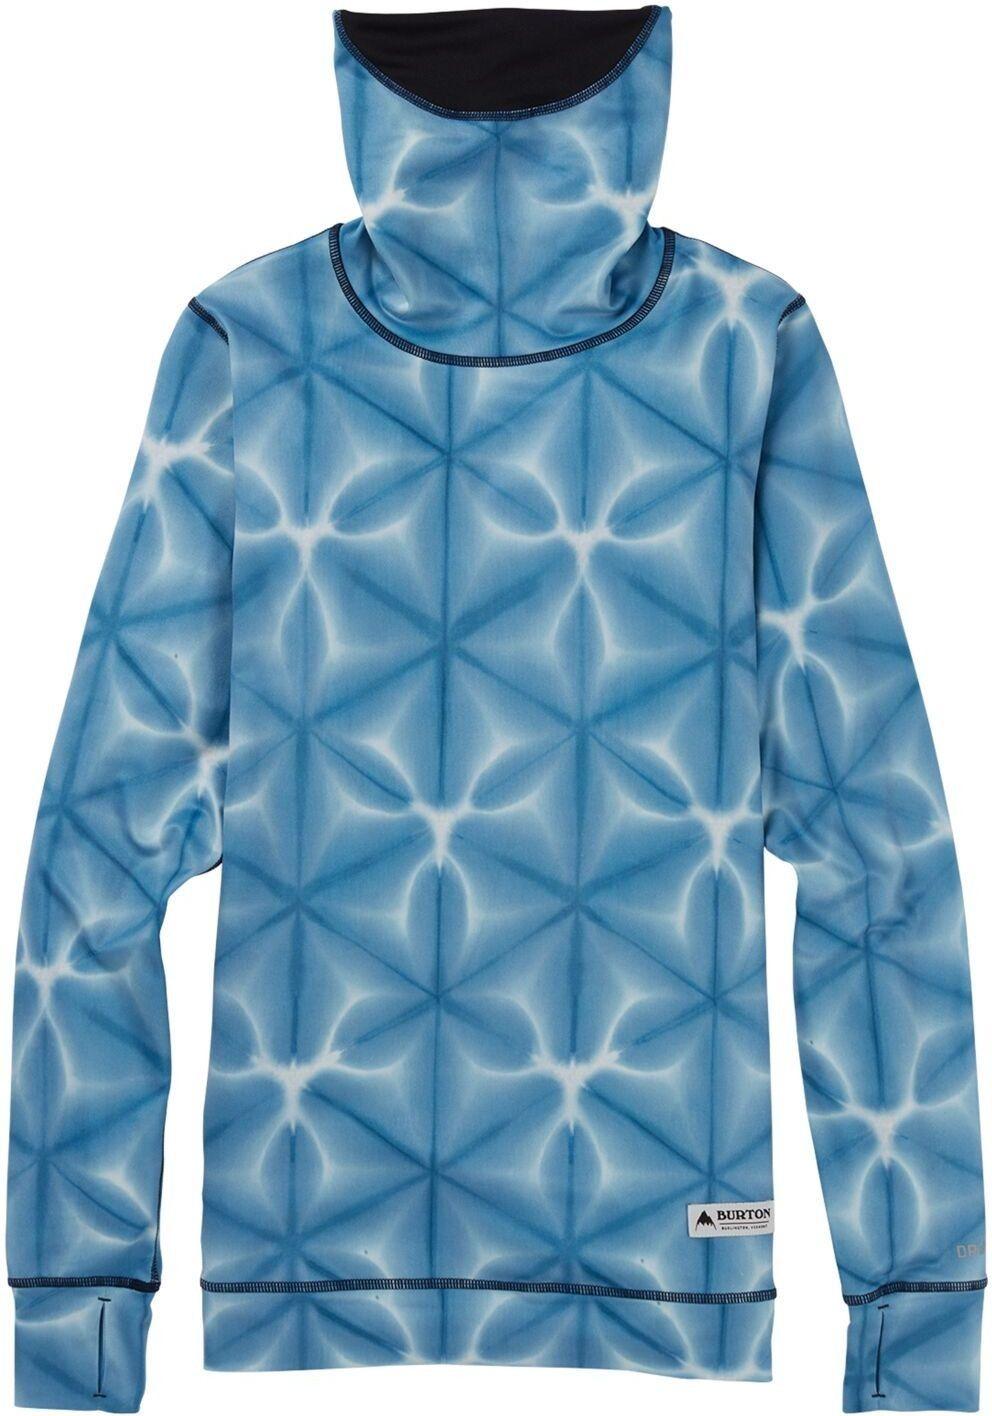 koszulka termoaktywna BURTON - Mdwt Long Neck Blue Dailola Shibori (402) rozmiar: S